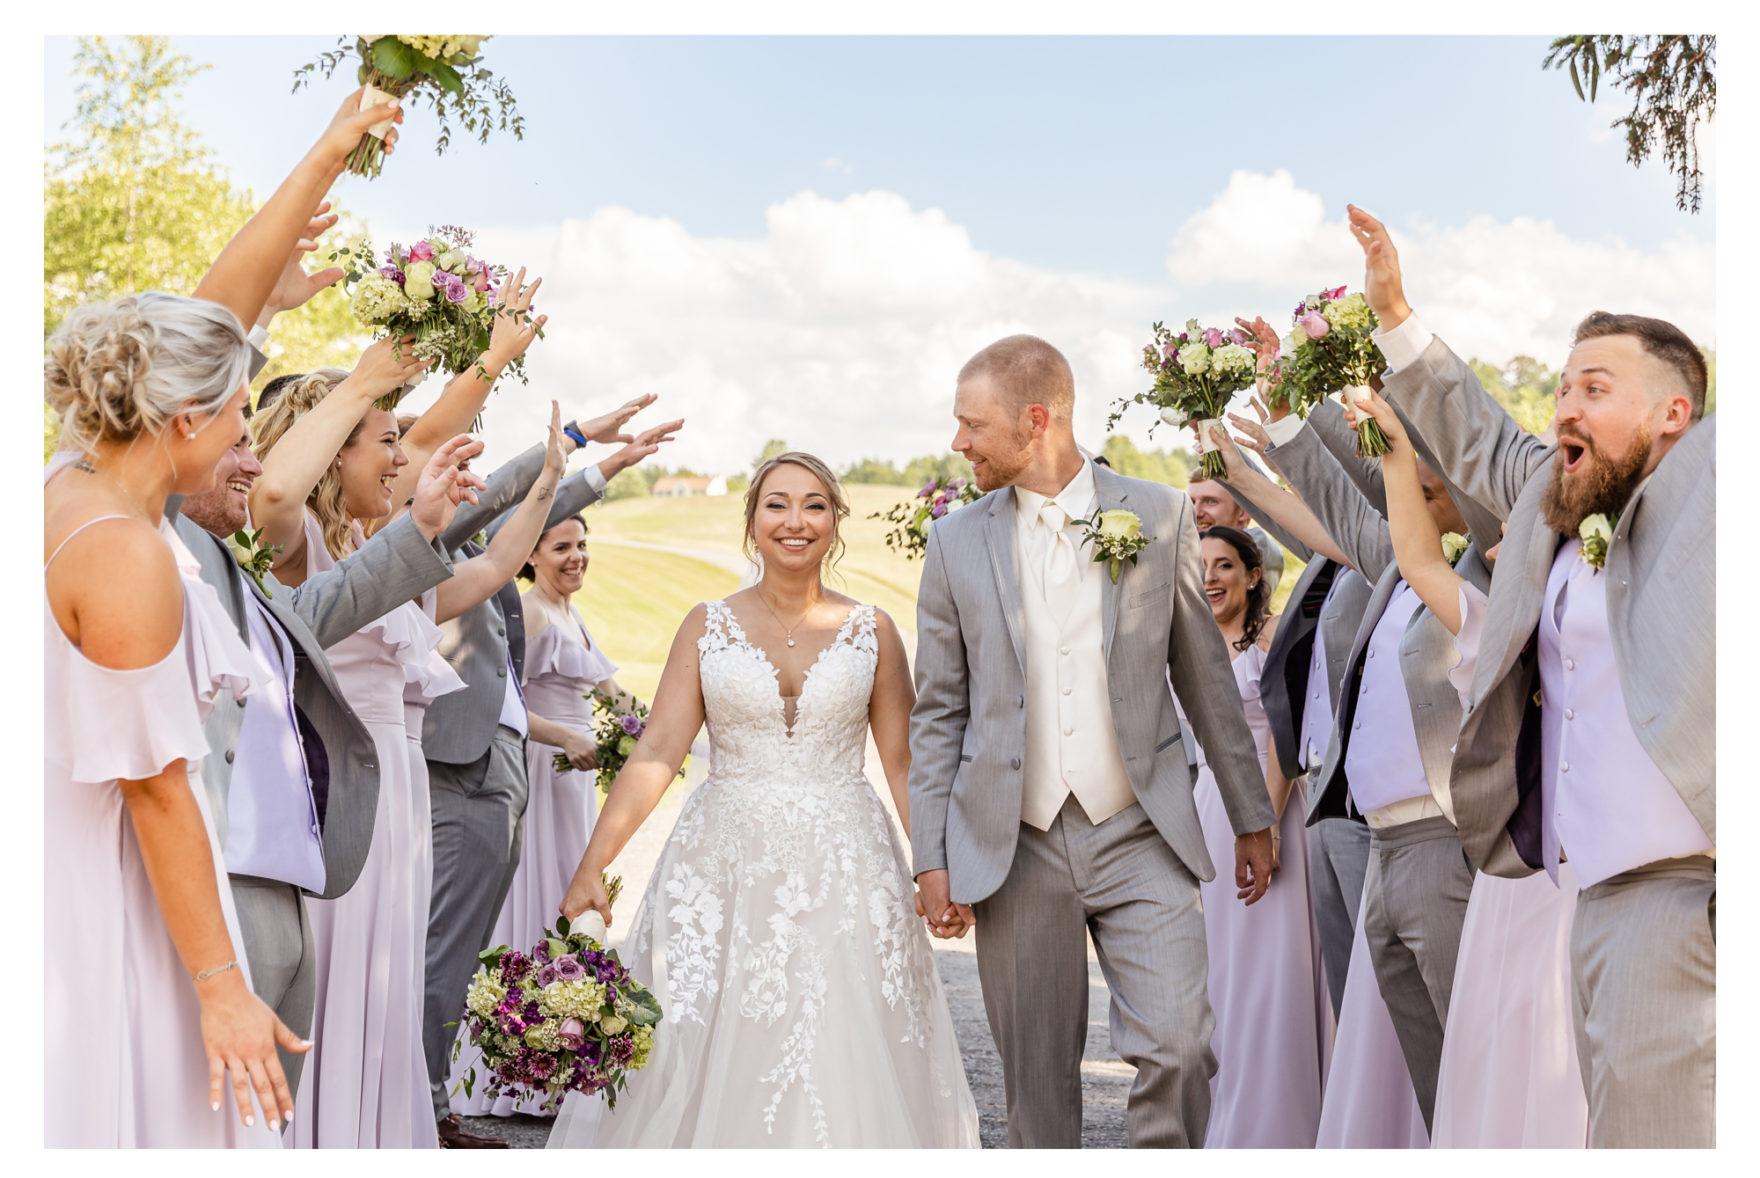 Summer Wedding Stone Ridge Hollow June Wedding Lavender dresses bridal party